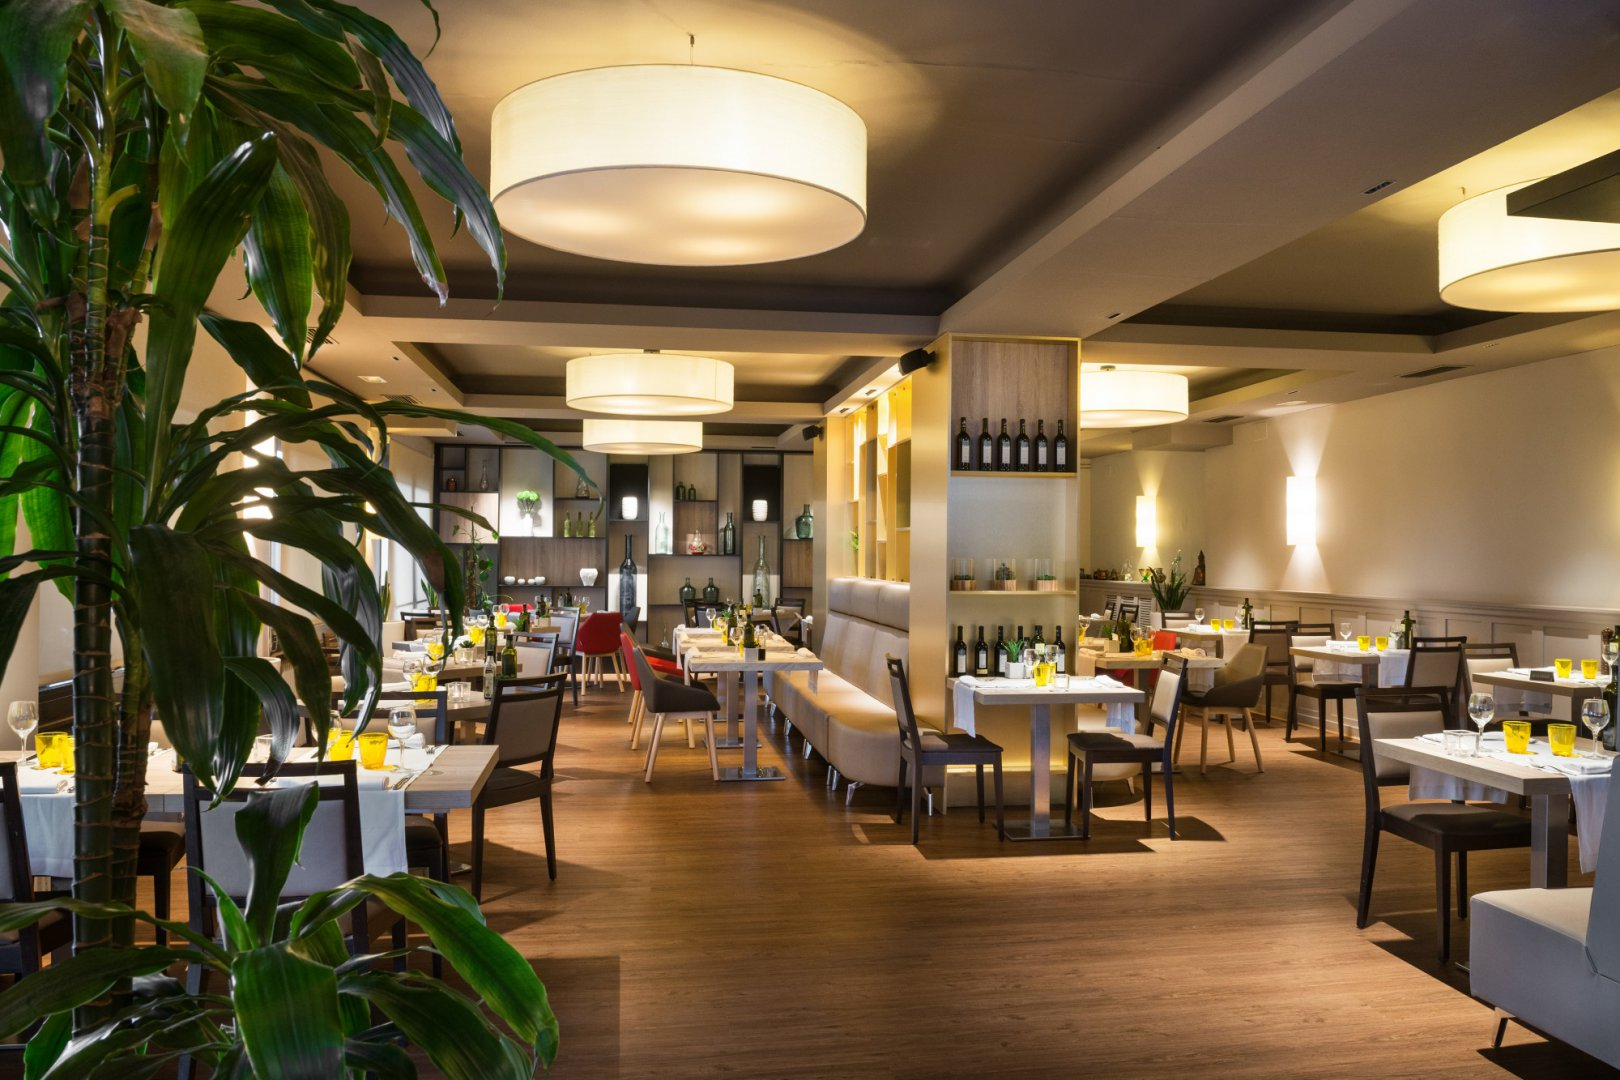 https://www.restaurantronda.com/imagecache/uploads_images_paginas_home_1620x1080_c_dsc-7961-copia-irf.jpg